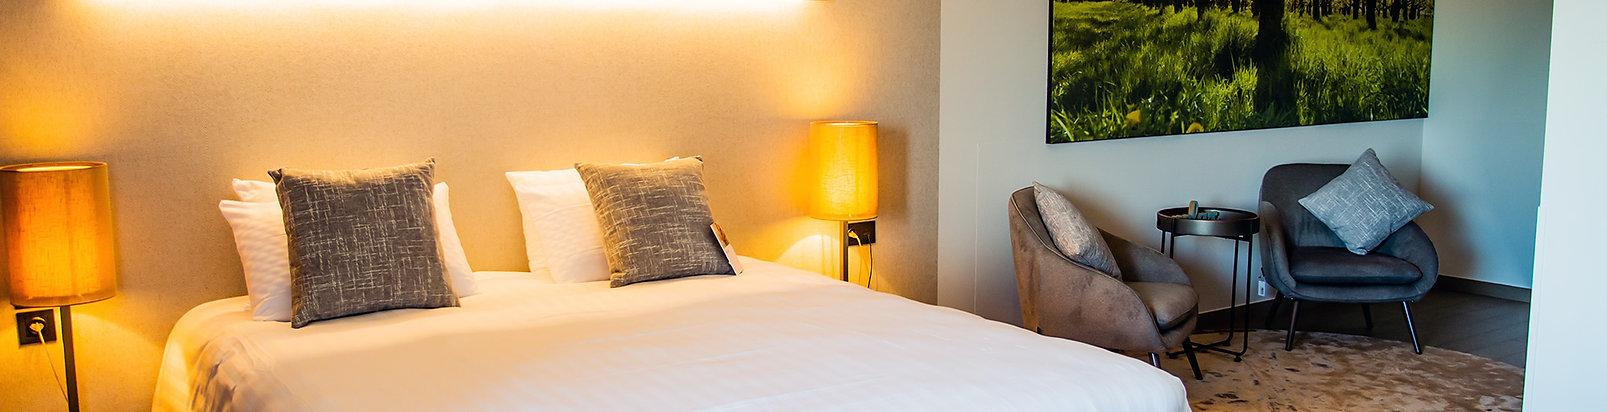 hotel-stayen-header-studio-room.jpg